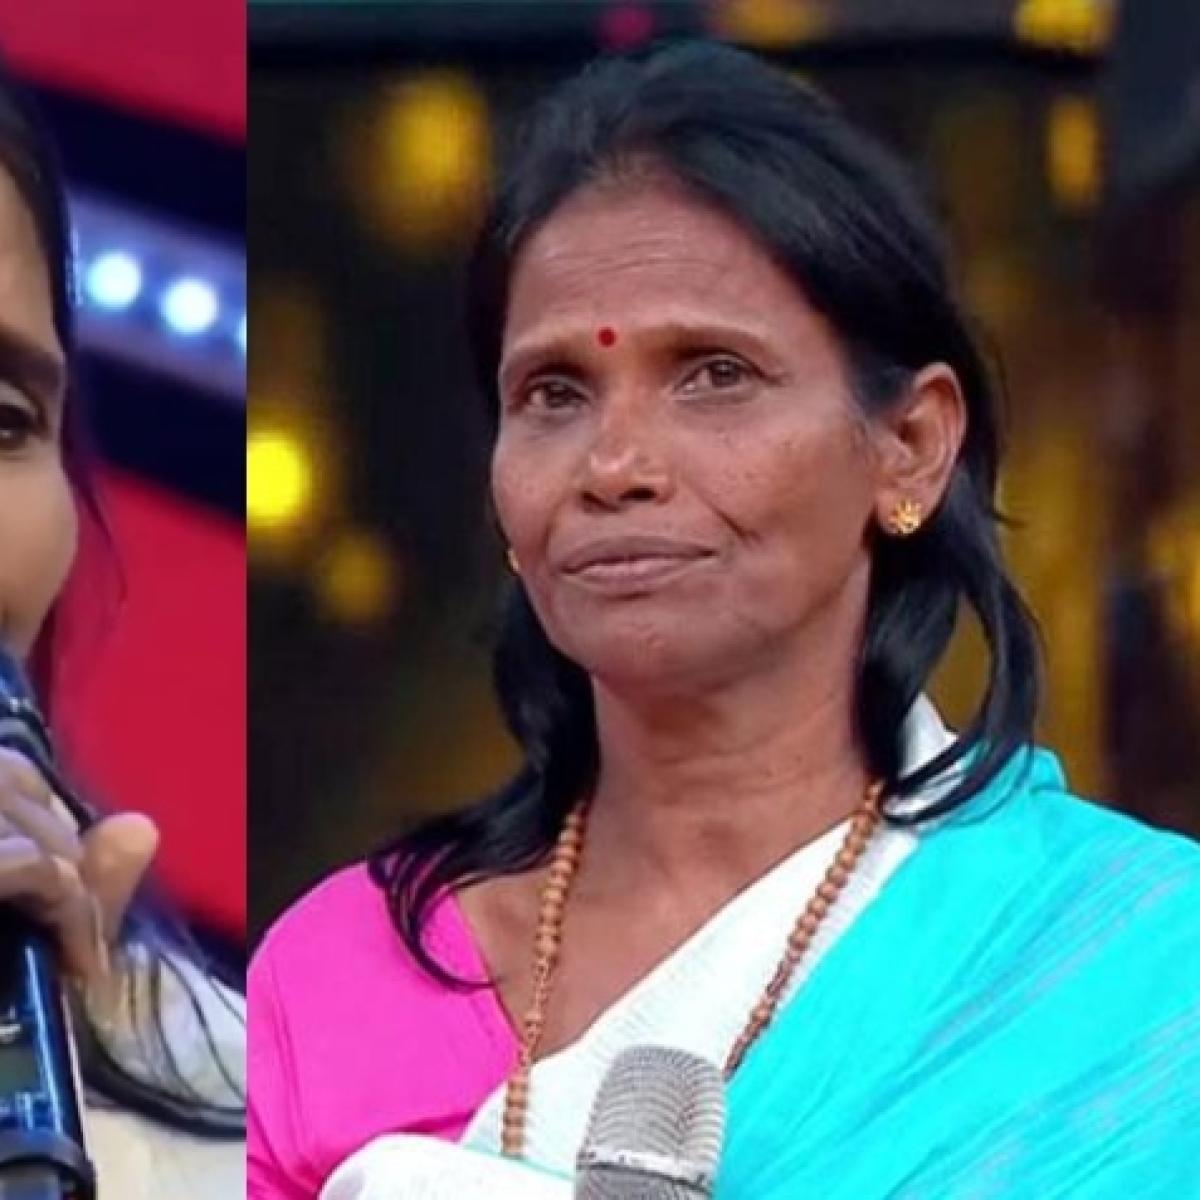 Watch: Ranu Mondal forgets the lyrics of Himesh Reshammiya's song on stage